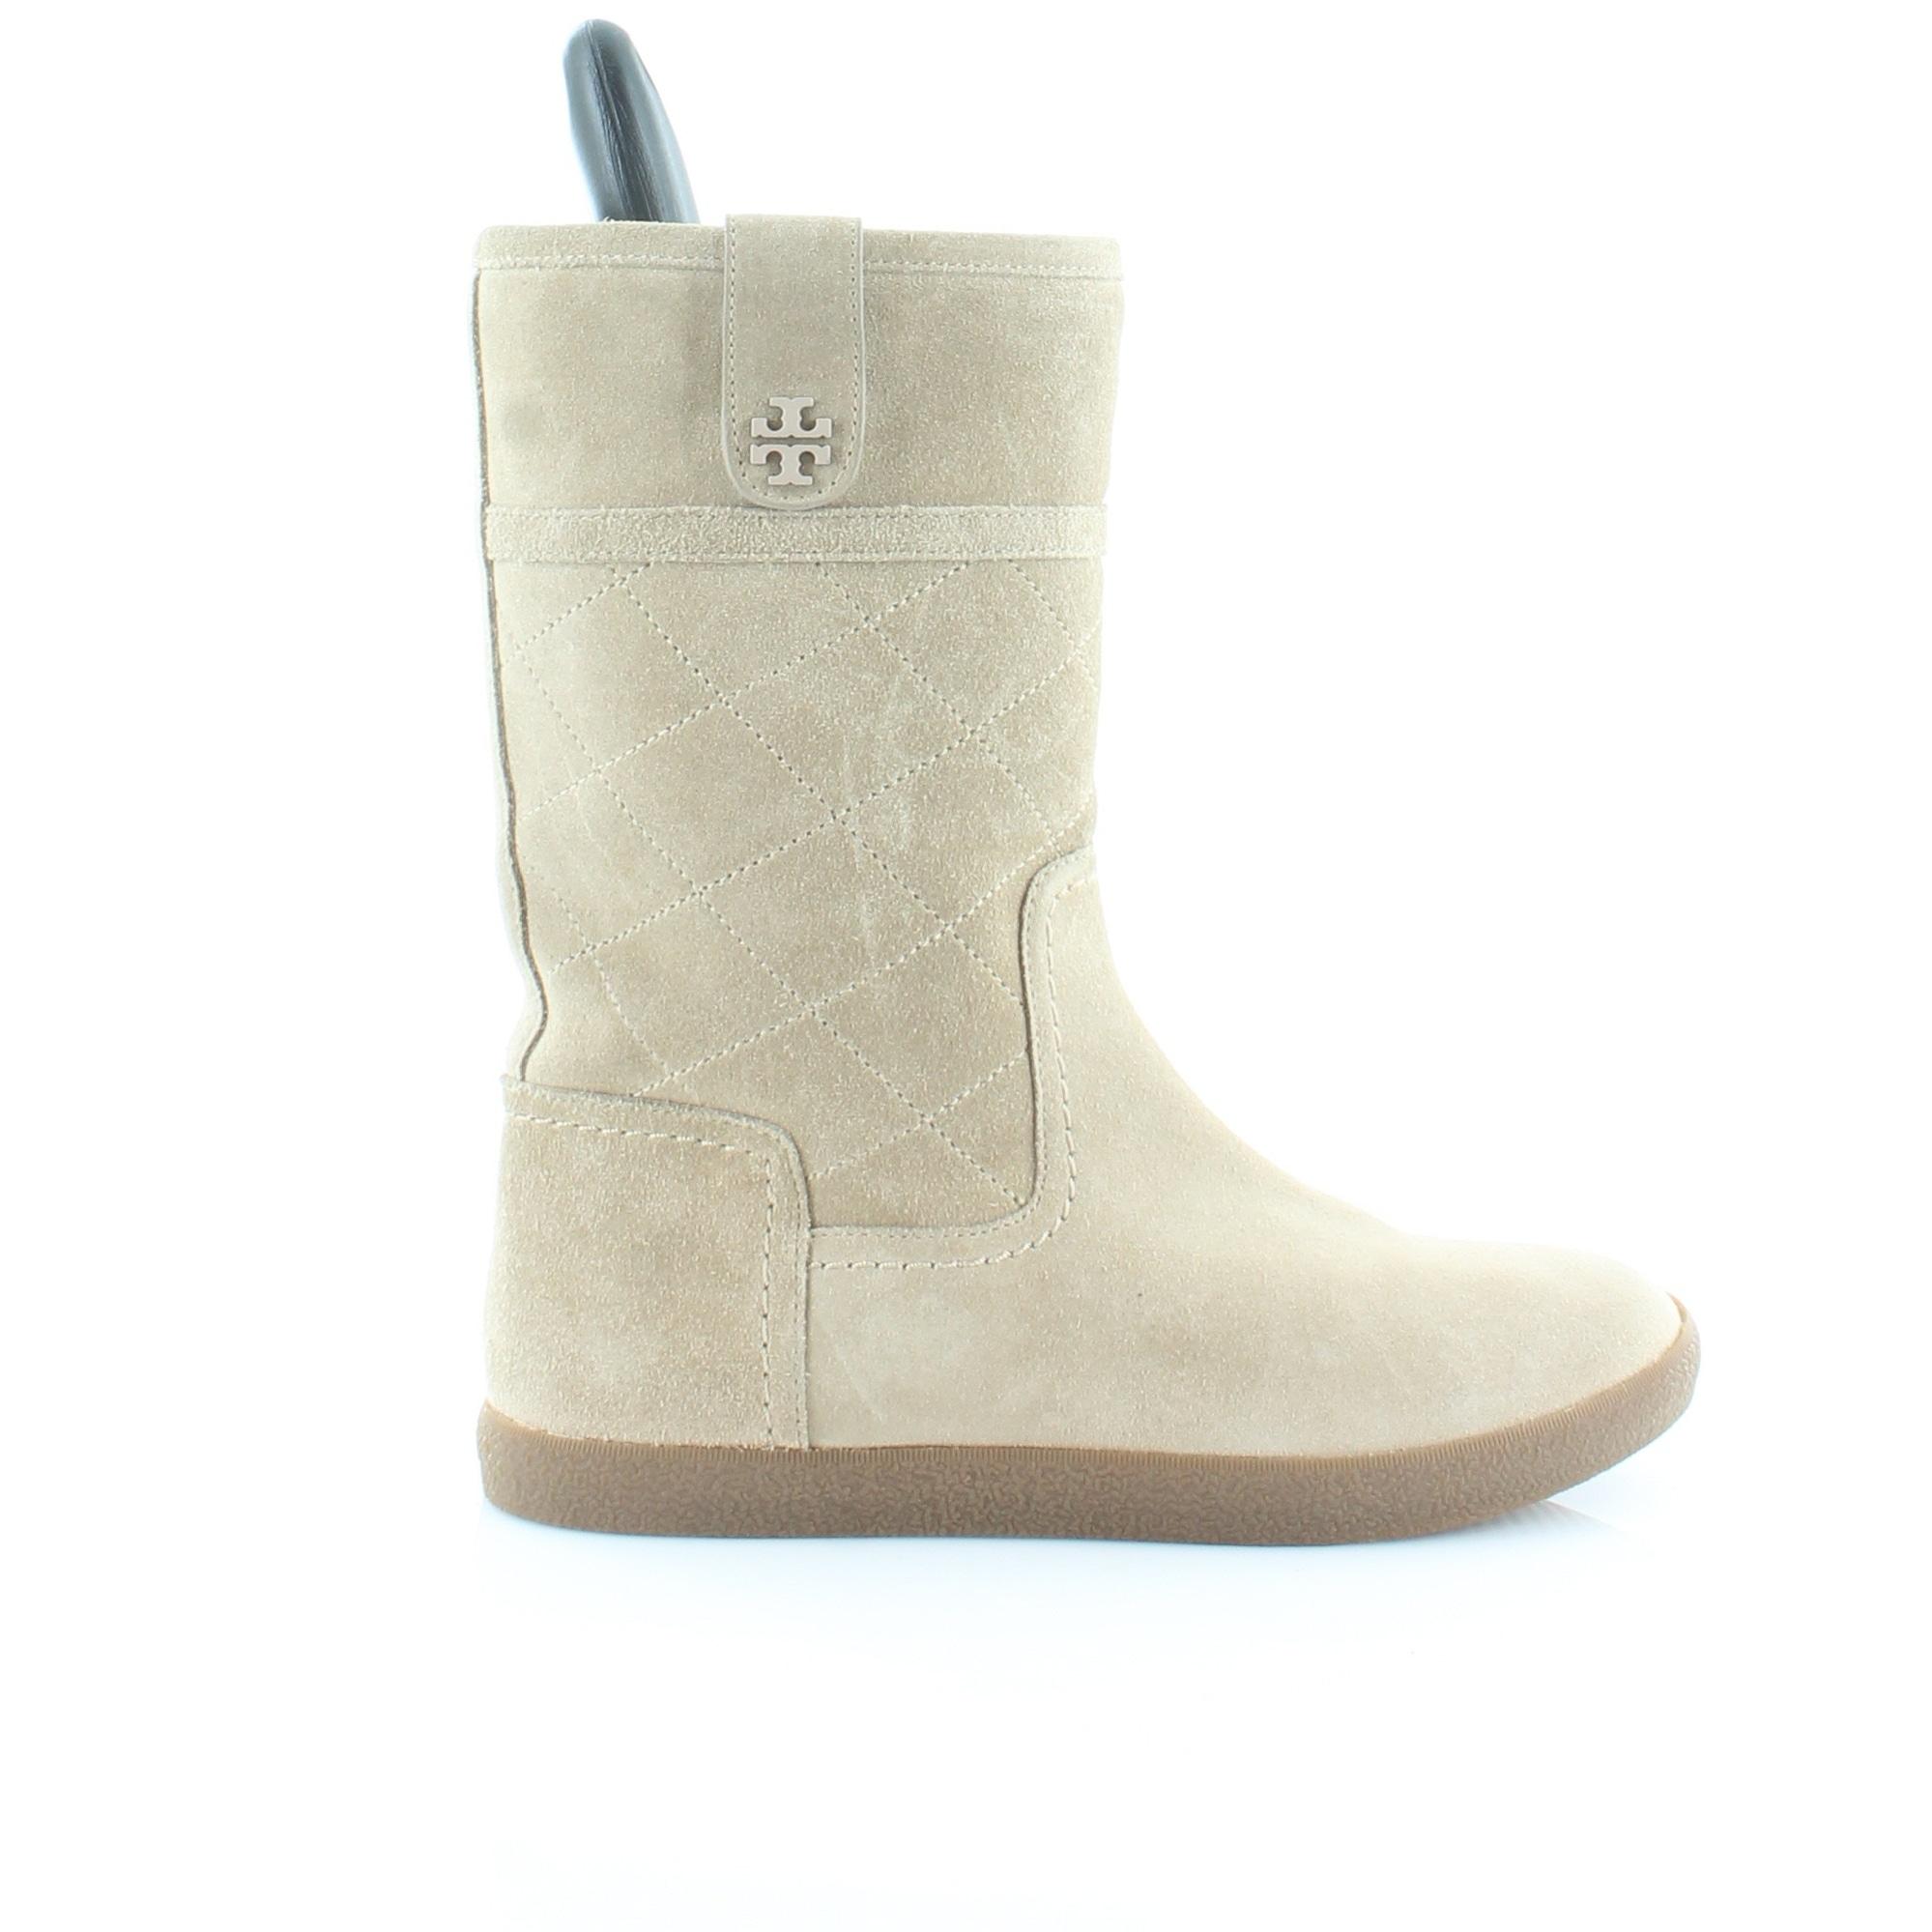 c318ec6e9a11a Shop Tory Burch Alana Women s Boots Light Natural - Free Shipping Today -  Overstock - 21550369